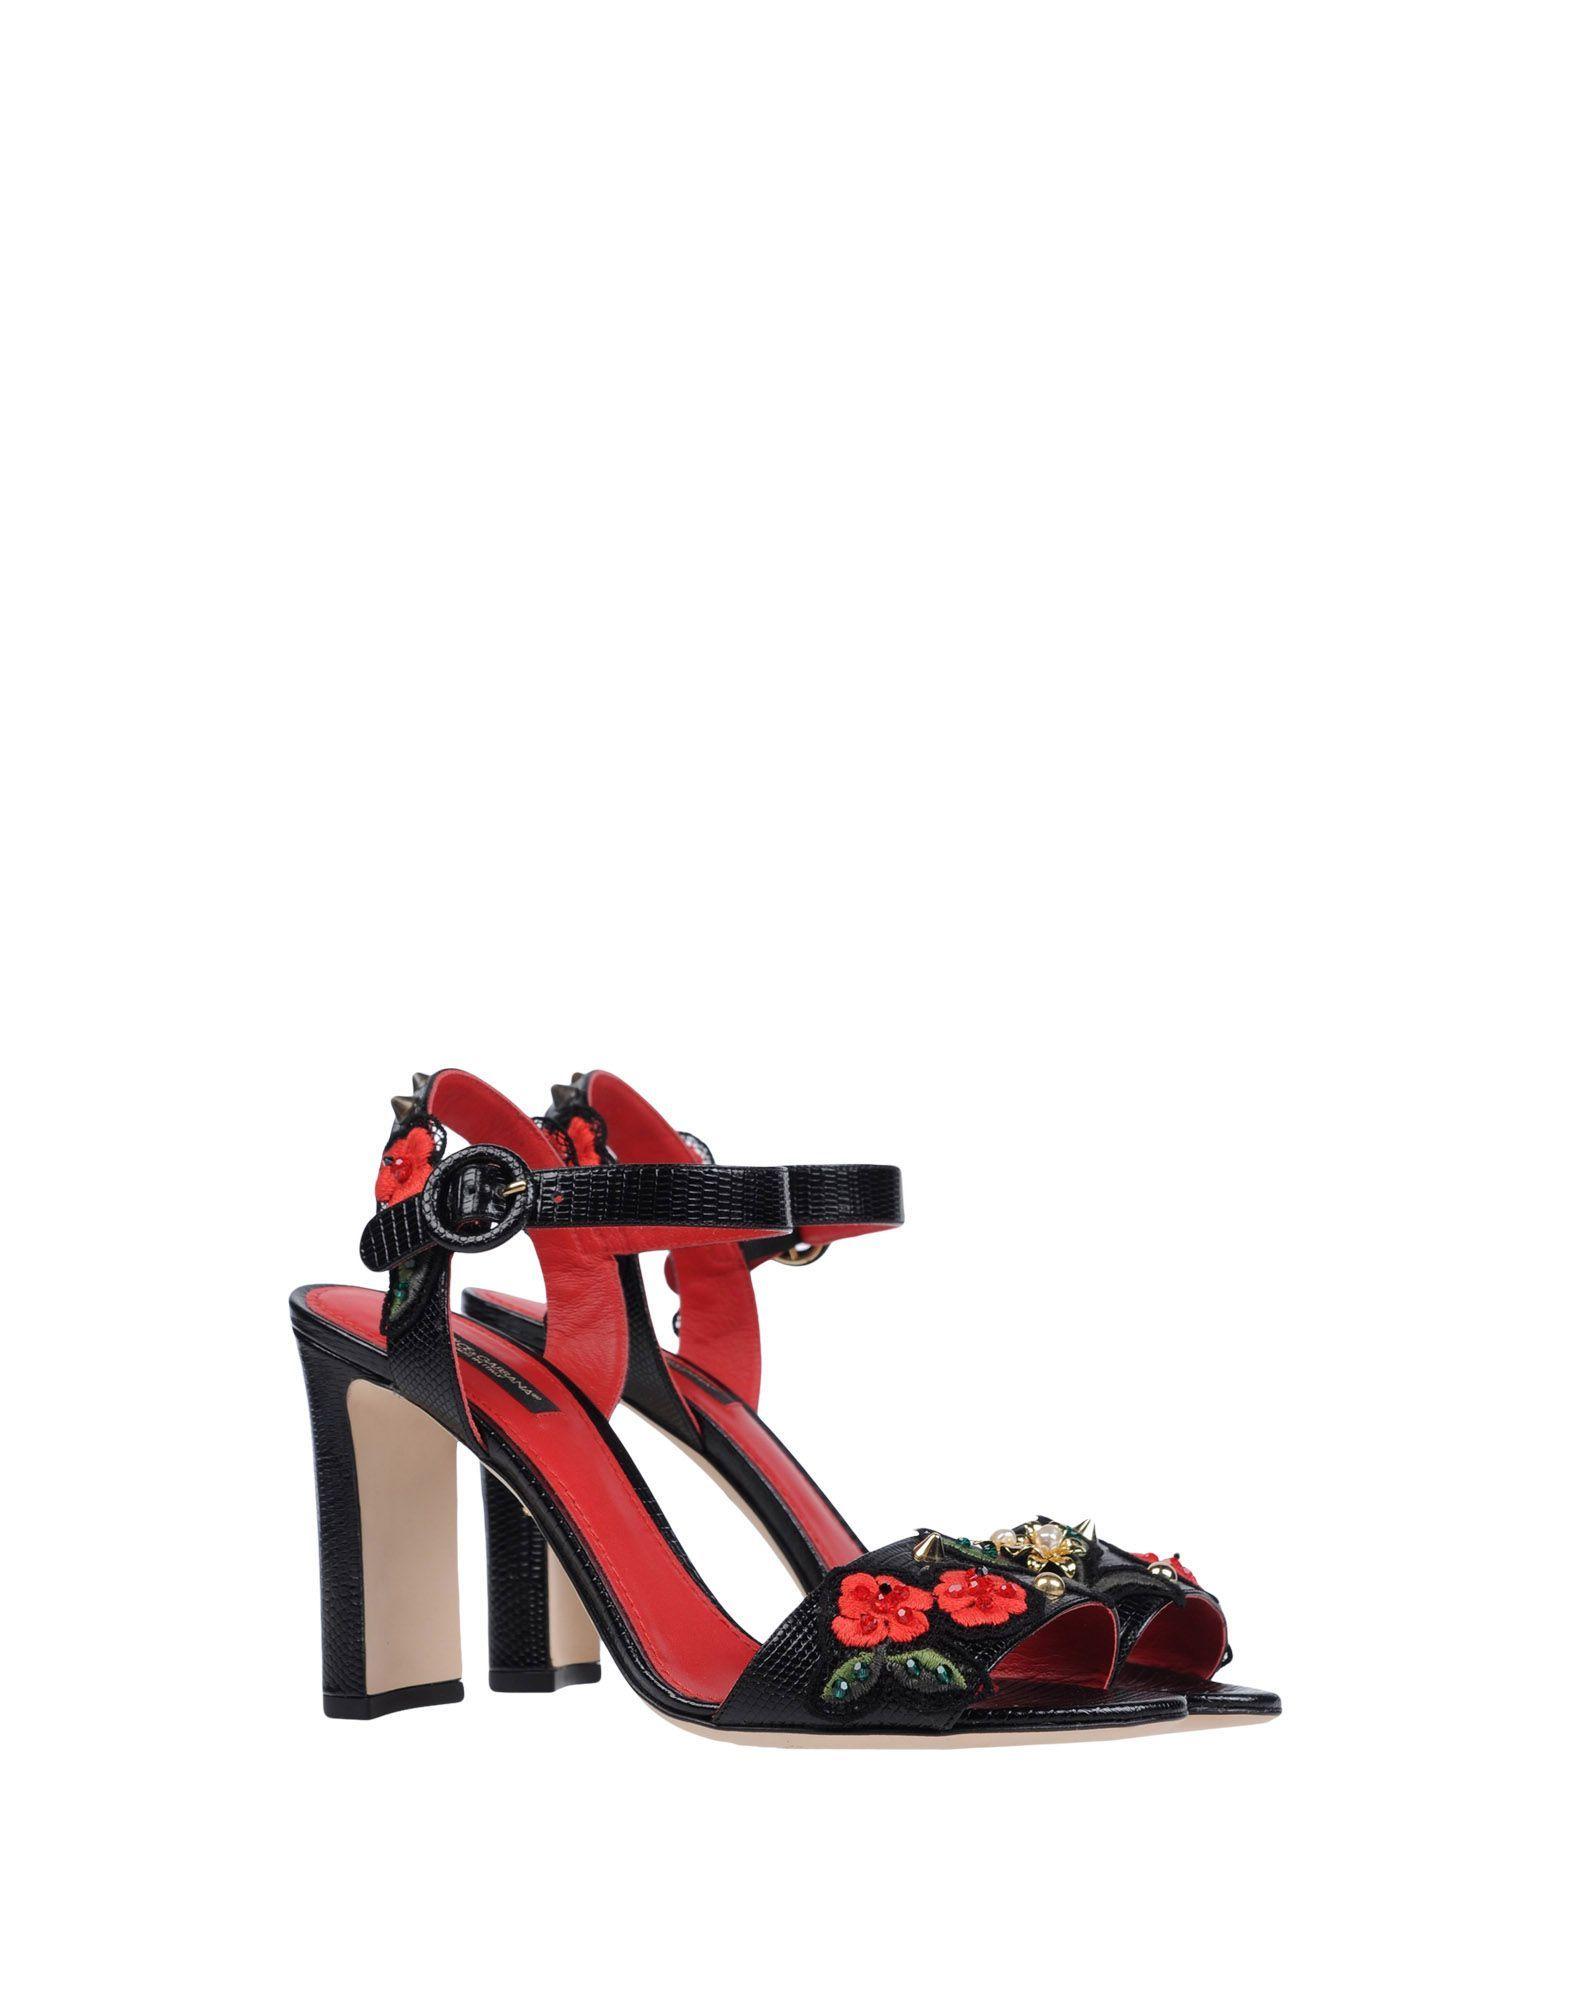 411d9dfb400486 Dolce   Gabbana Sandals - Women Dolce   Gabbana Sandals online on YOOX  United States - 11149093JW